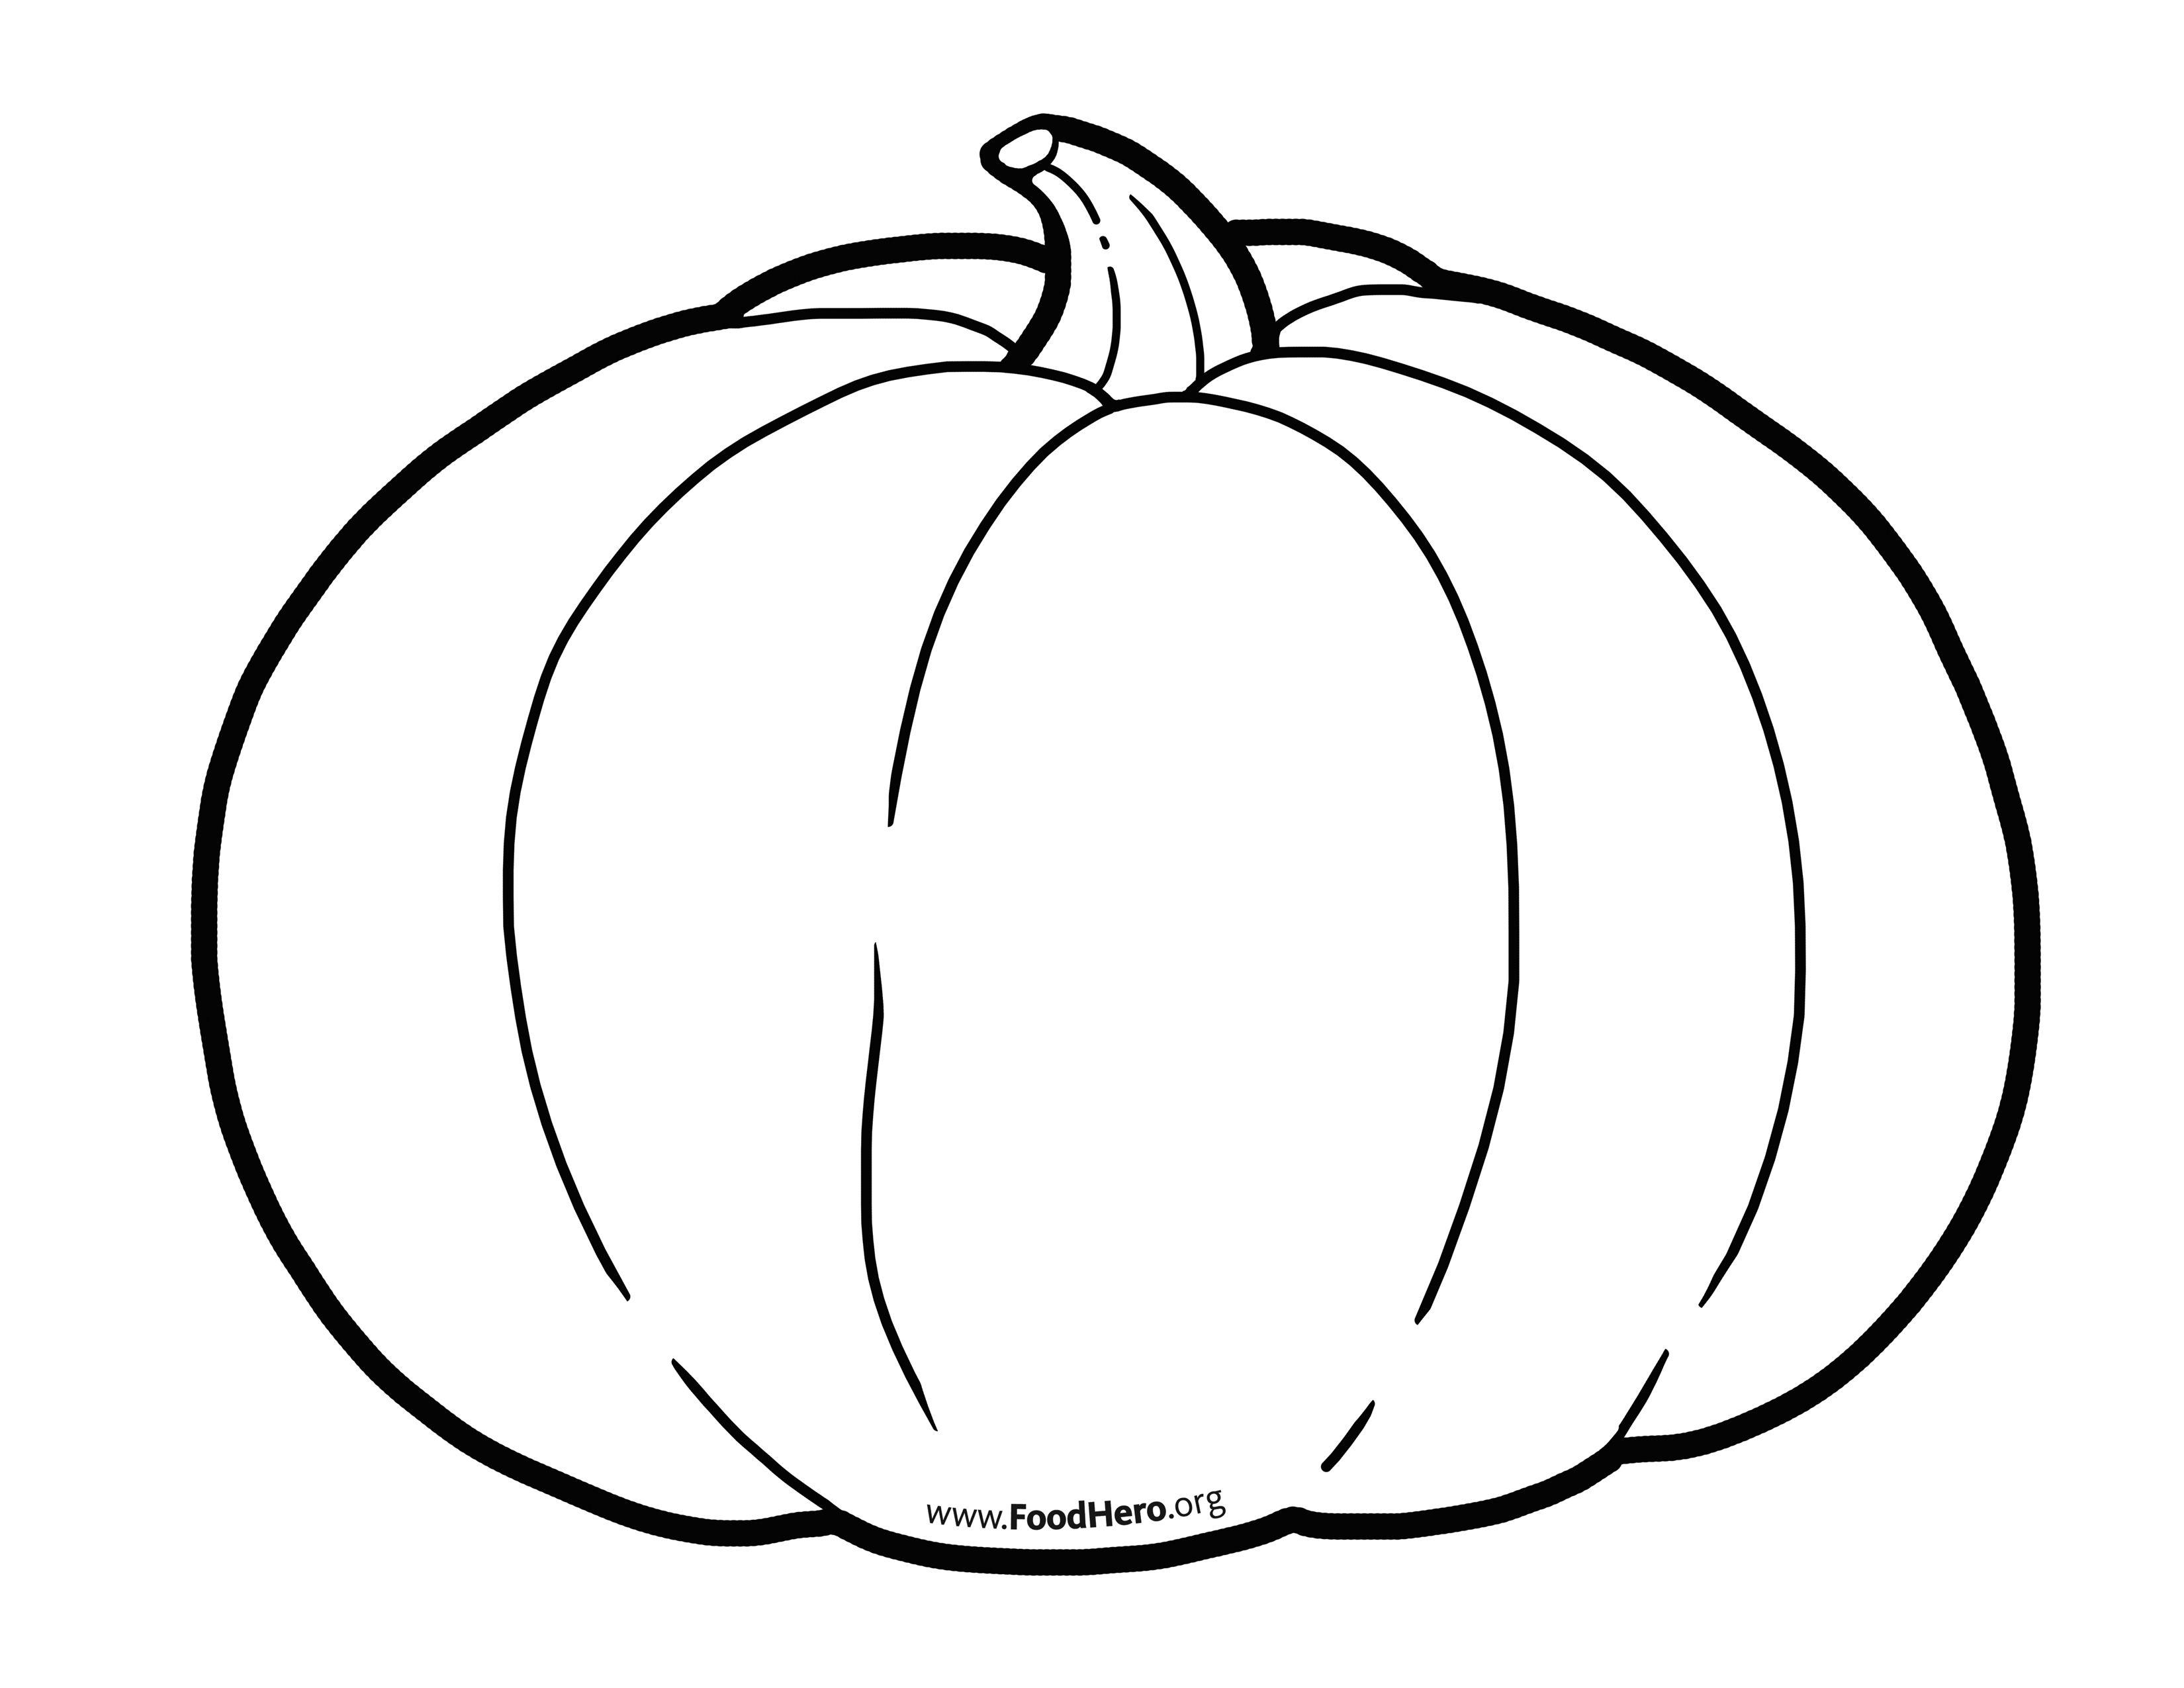 Pumpkin Illustration Foodhero Outline Bullentinboards